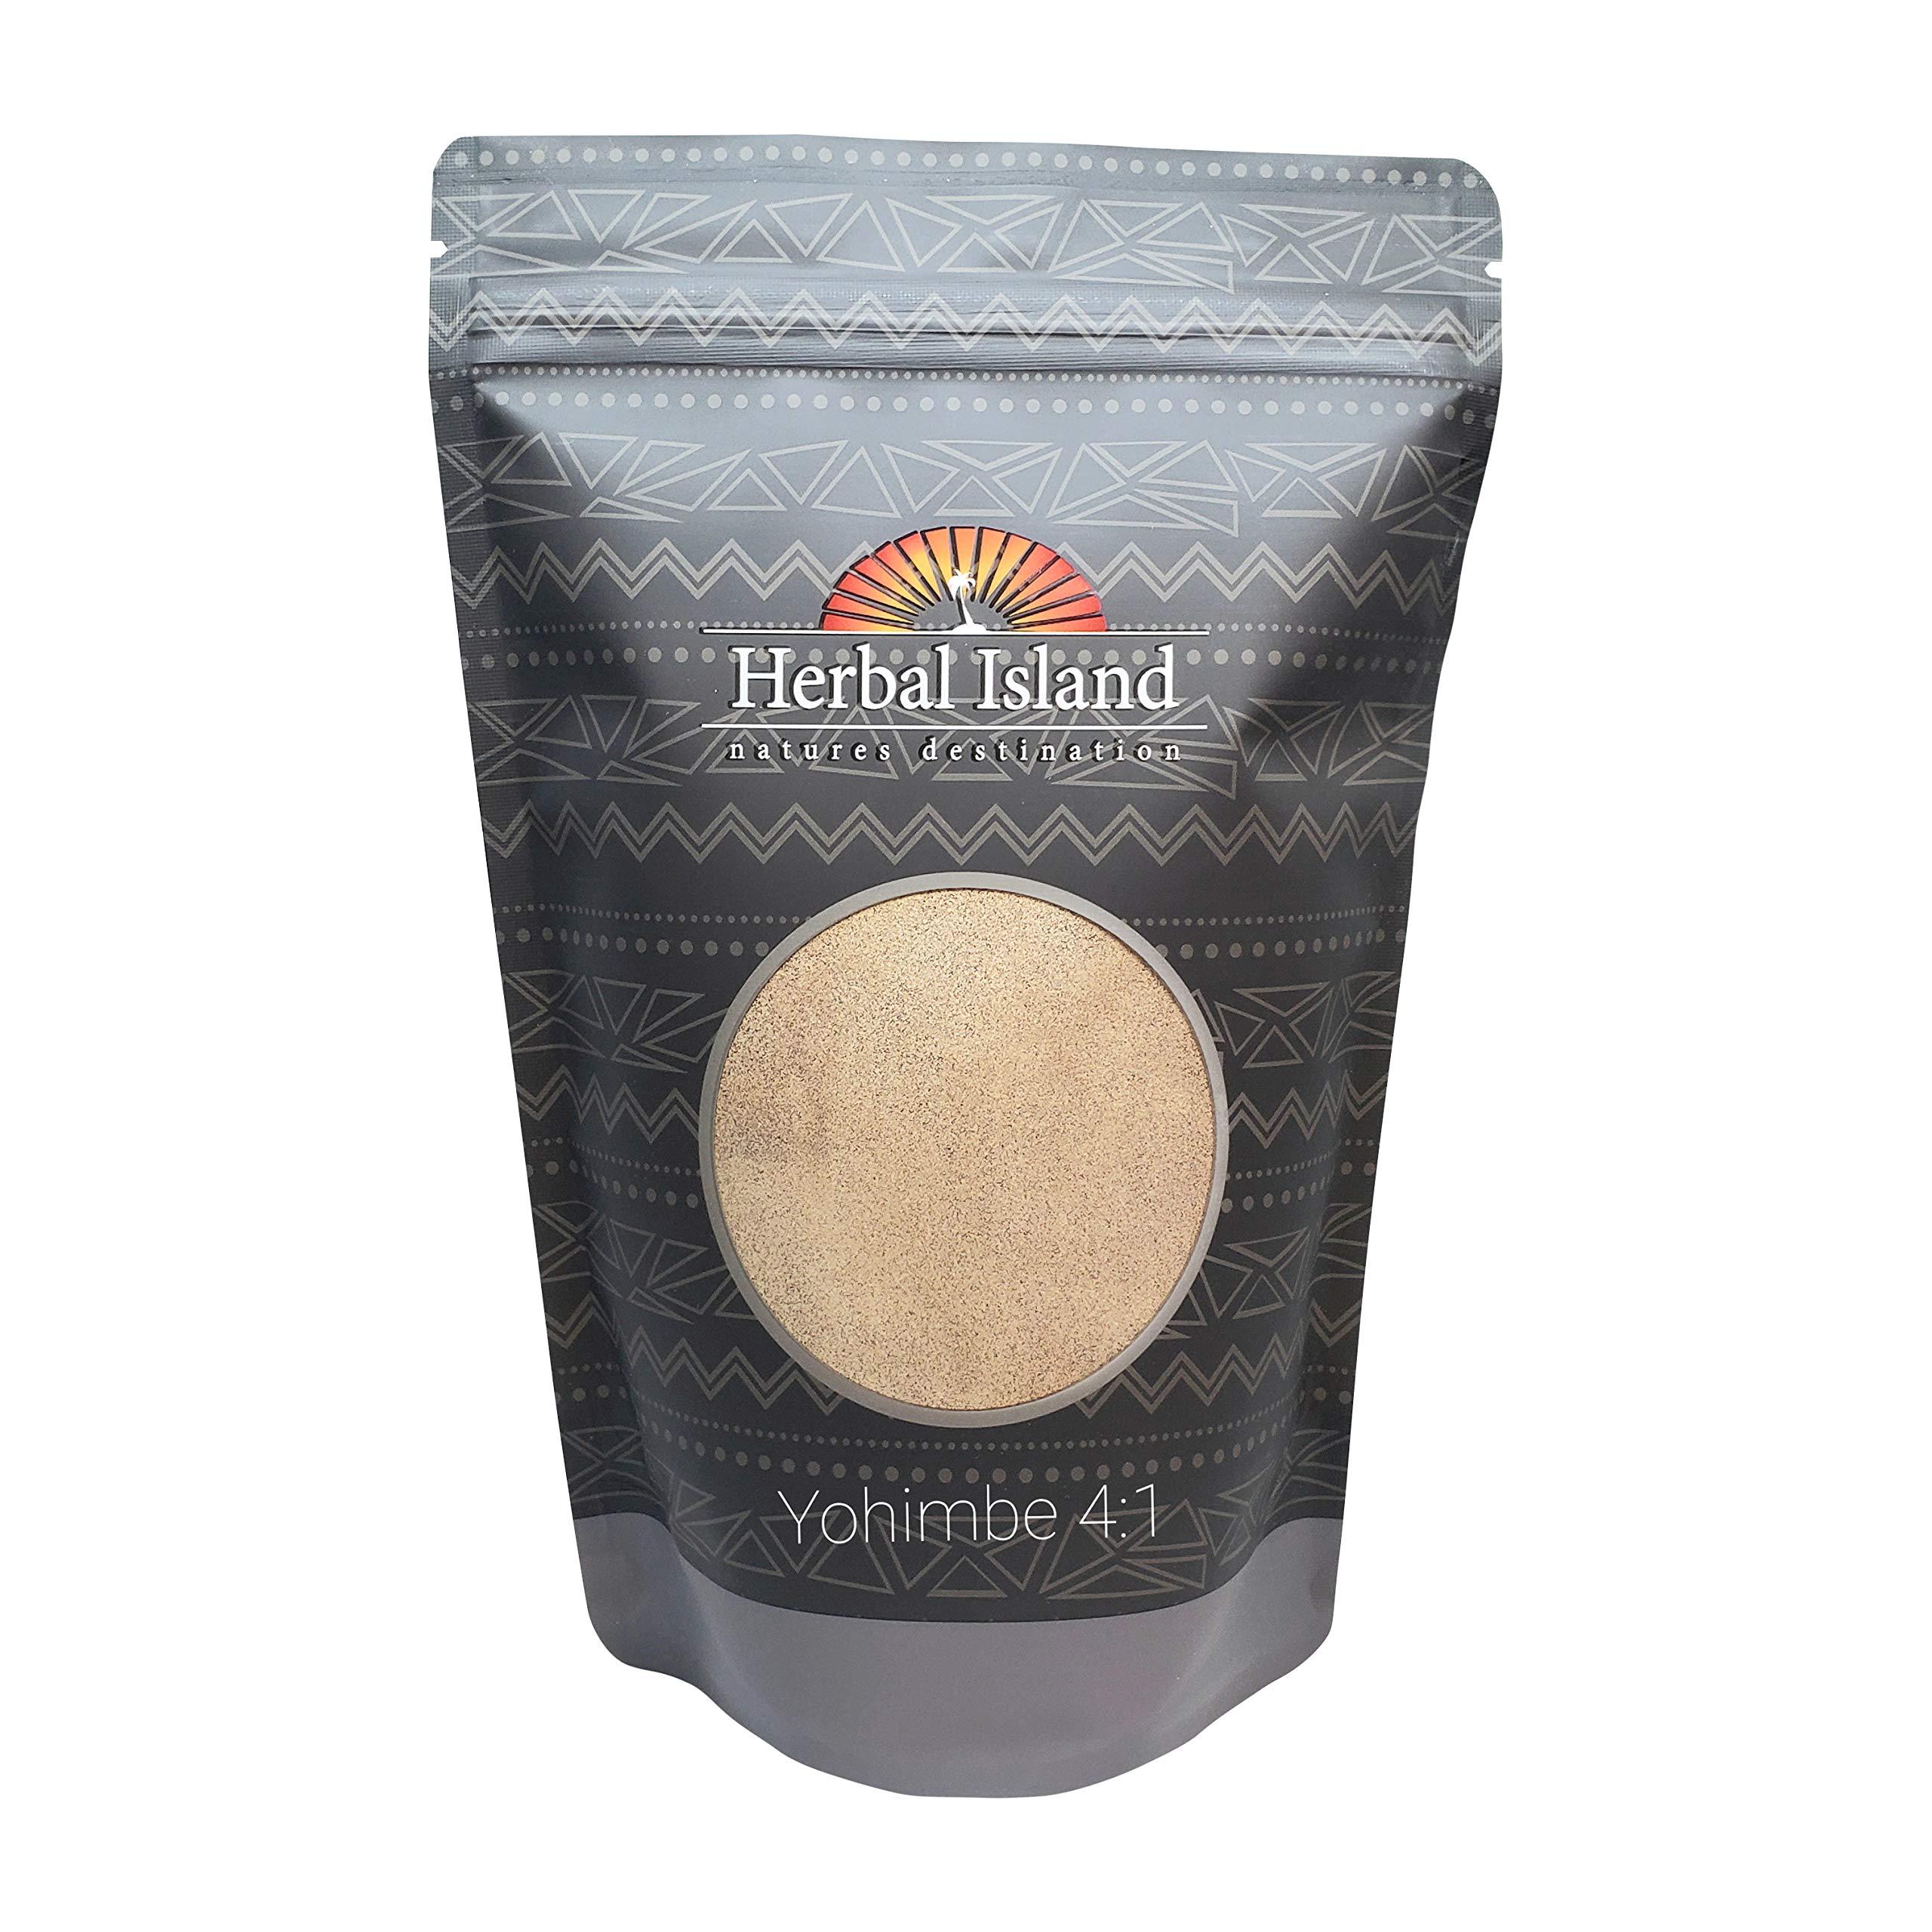 Yohimbe Bark Extract 5:1 Powder 1 LB or 16 OZ (Corynanthe Yohimbe) with Free Shipping